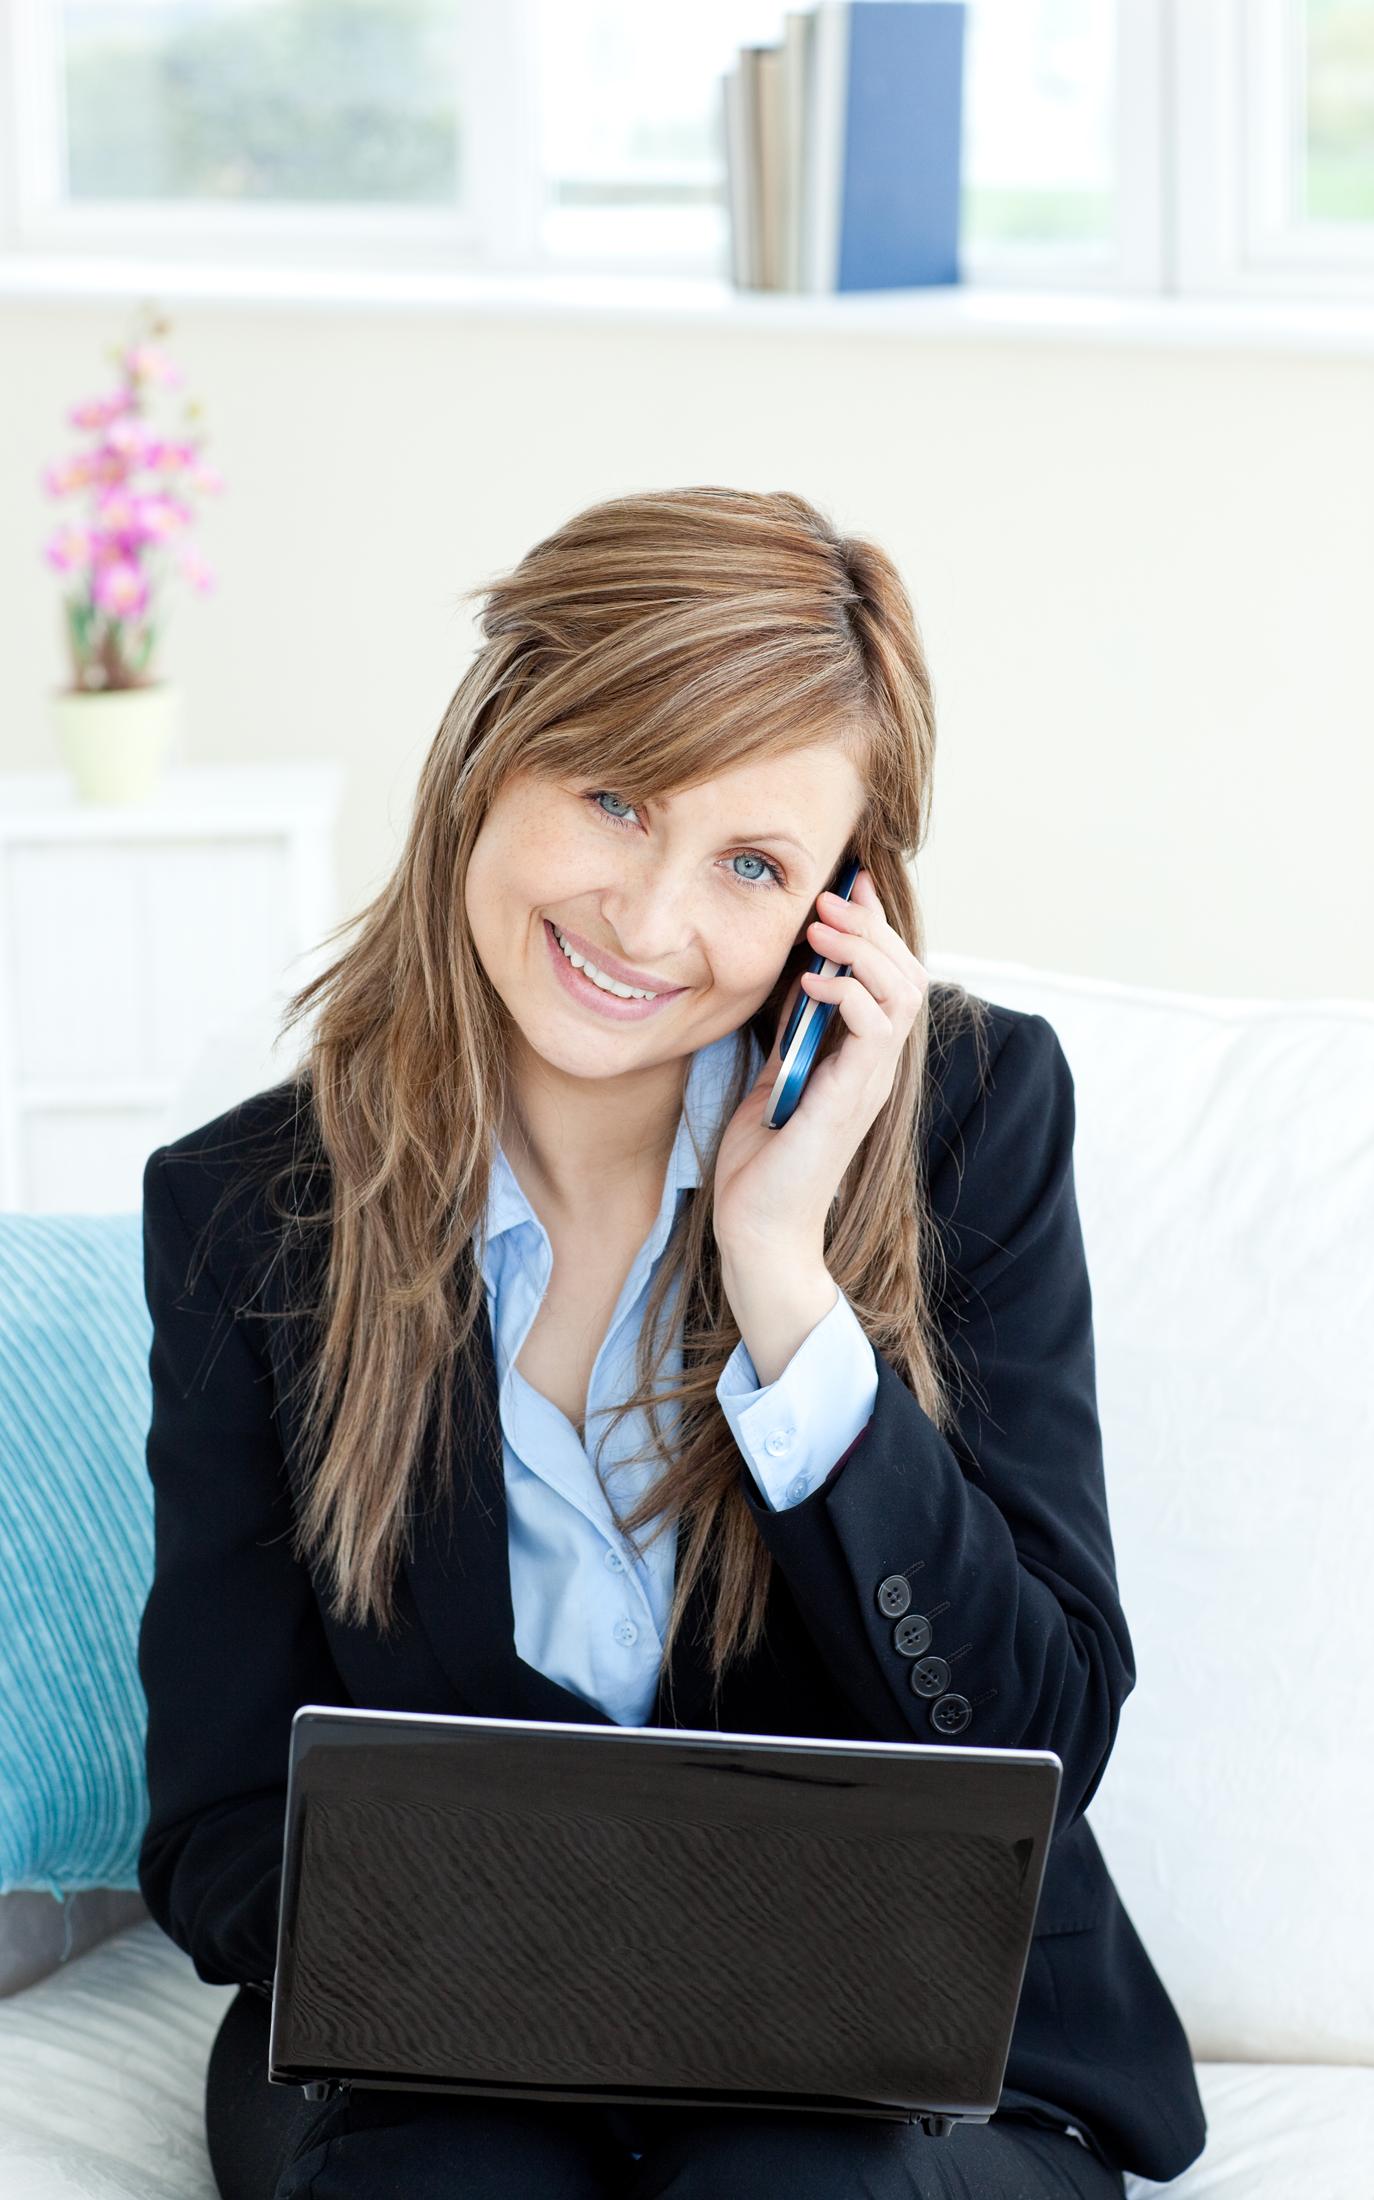 training consultant interview best practices